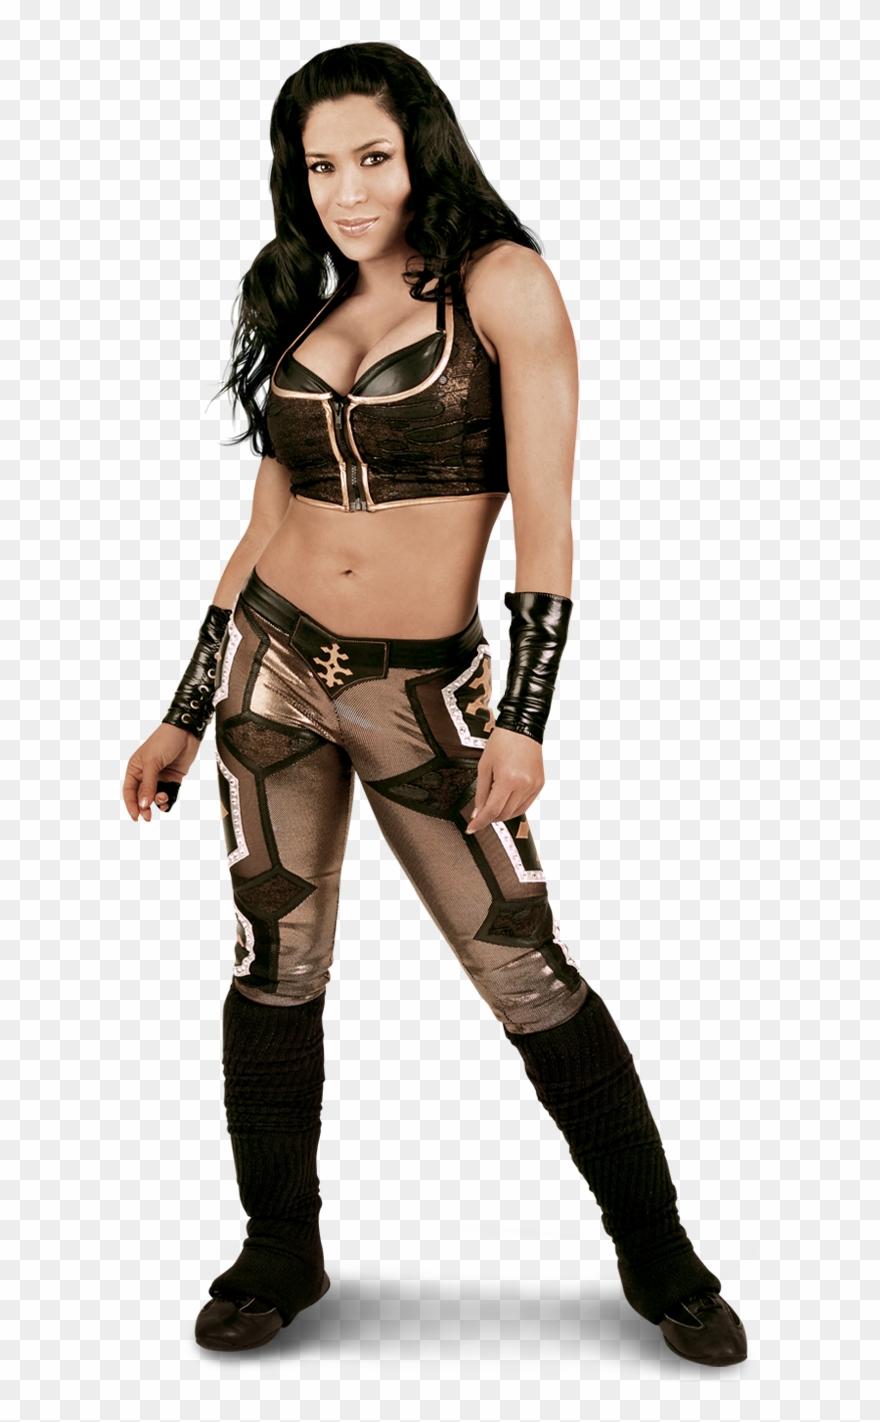 Vroom Vroom Royal Rumble Divas Wwe Belt Clip Art All Smackdown Vs Raw 2011 Melina Png Download 601967 Pinclipart